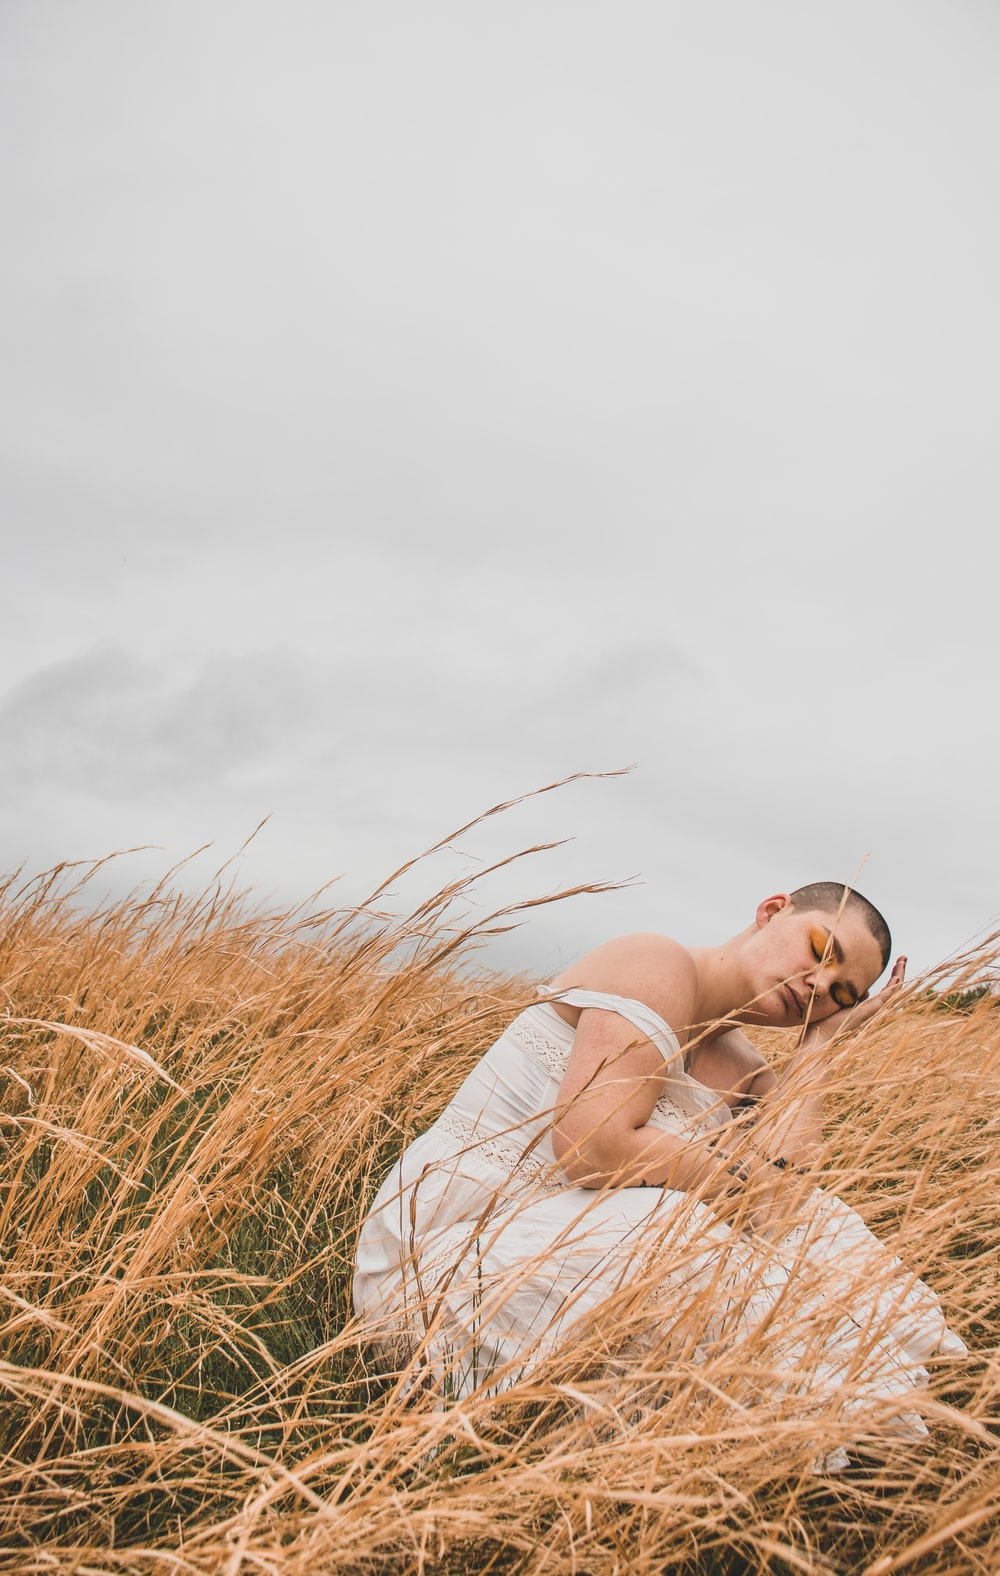 woman sitting on wheat grass